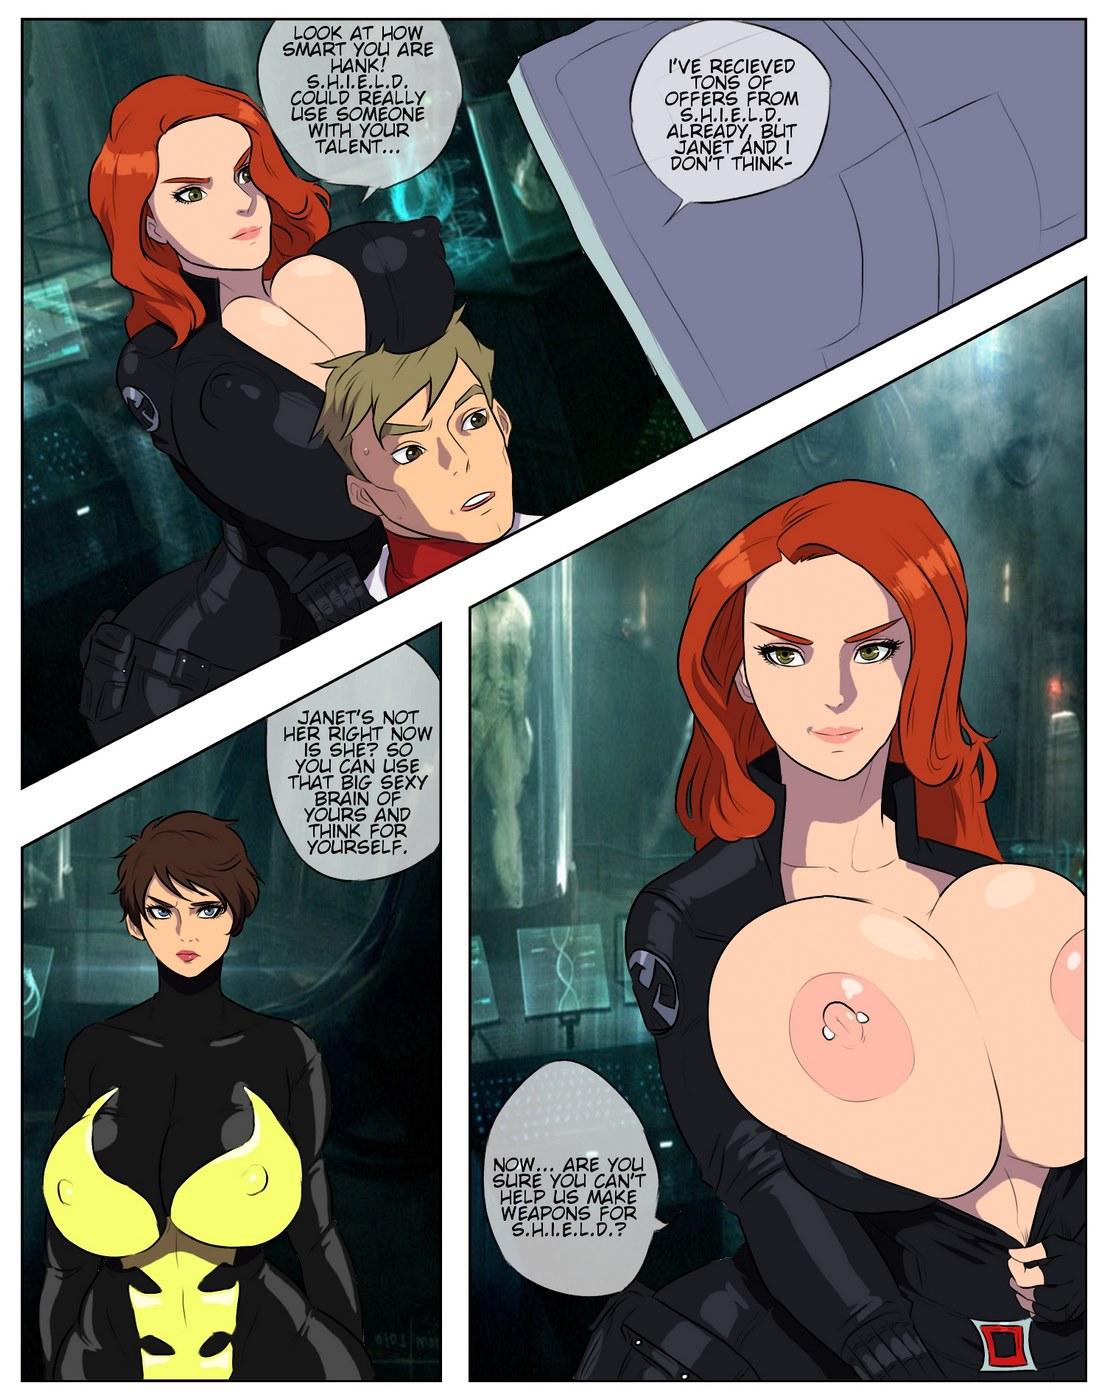 Porn Comics - WidowWasp (Avengers)- Jay Marvello porn comics 8 muses